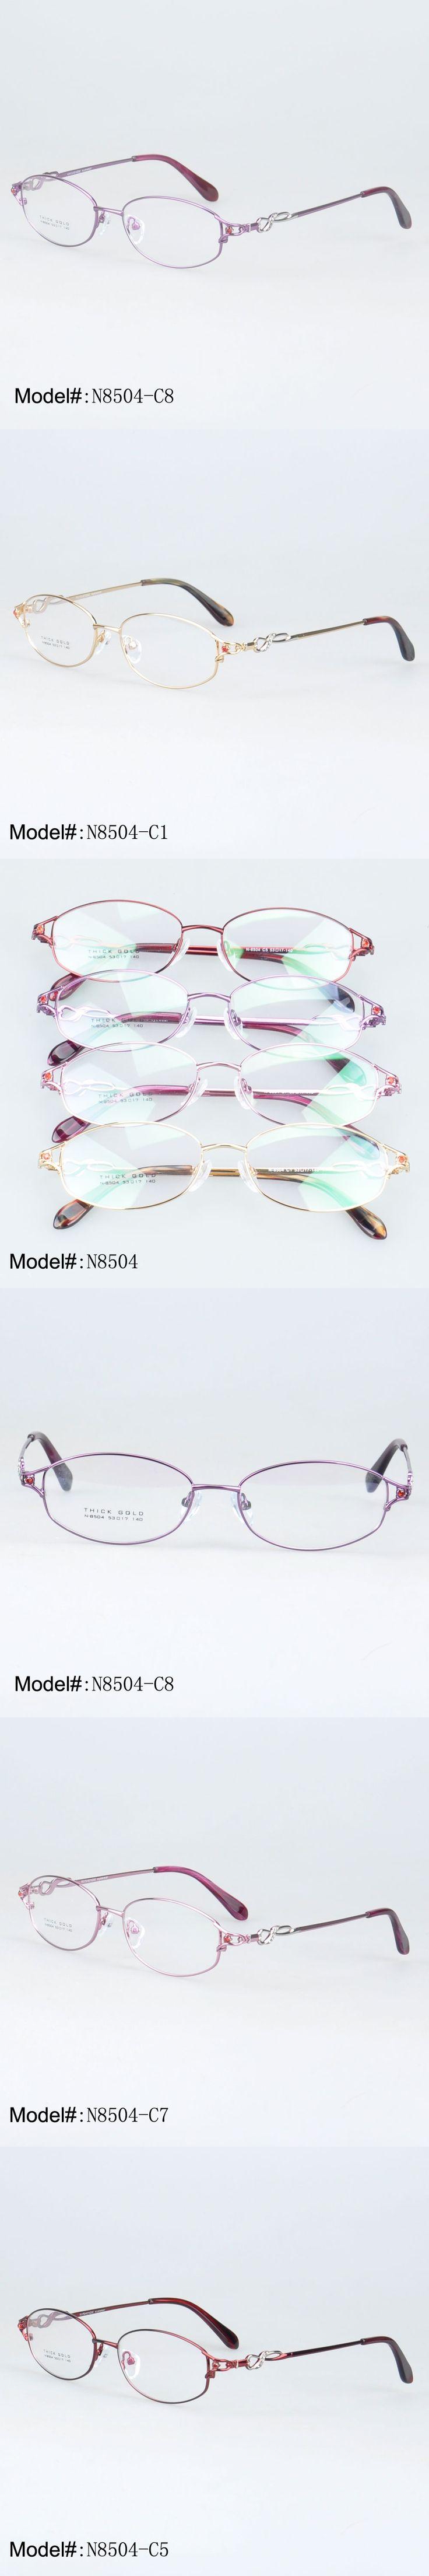 MY DOLI N8504 Full rim metal oval optical eyewear for beauty woman's frame myopia spectacles prescription eyewear